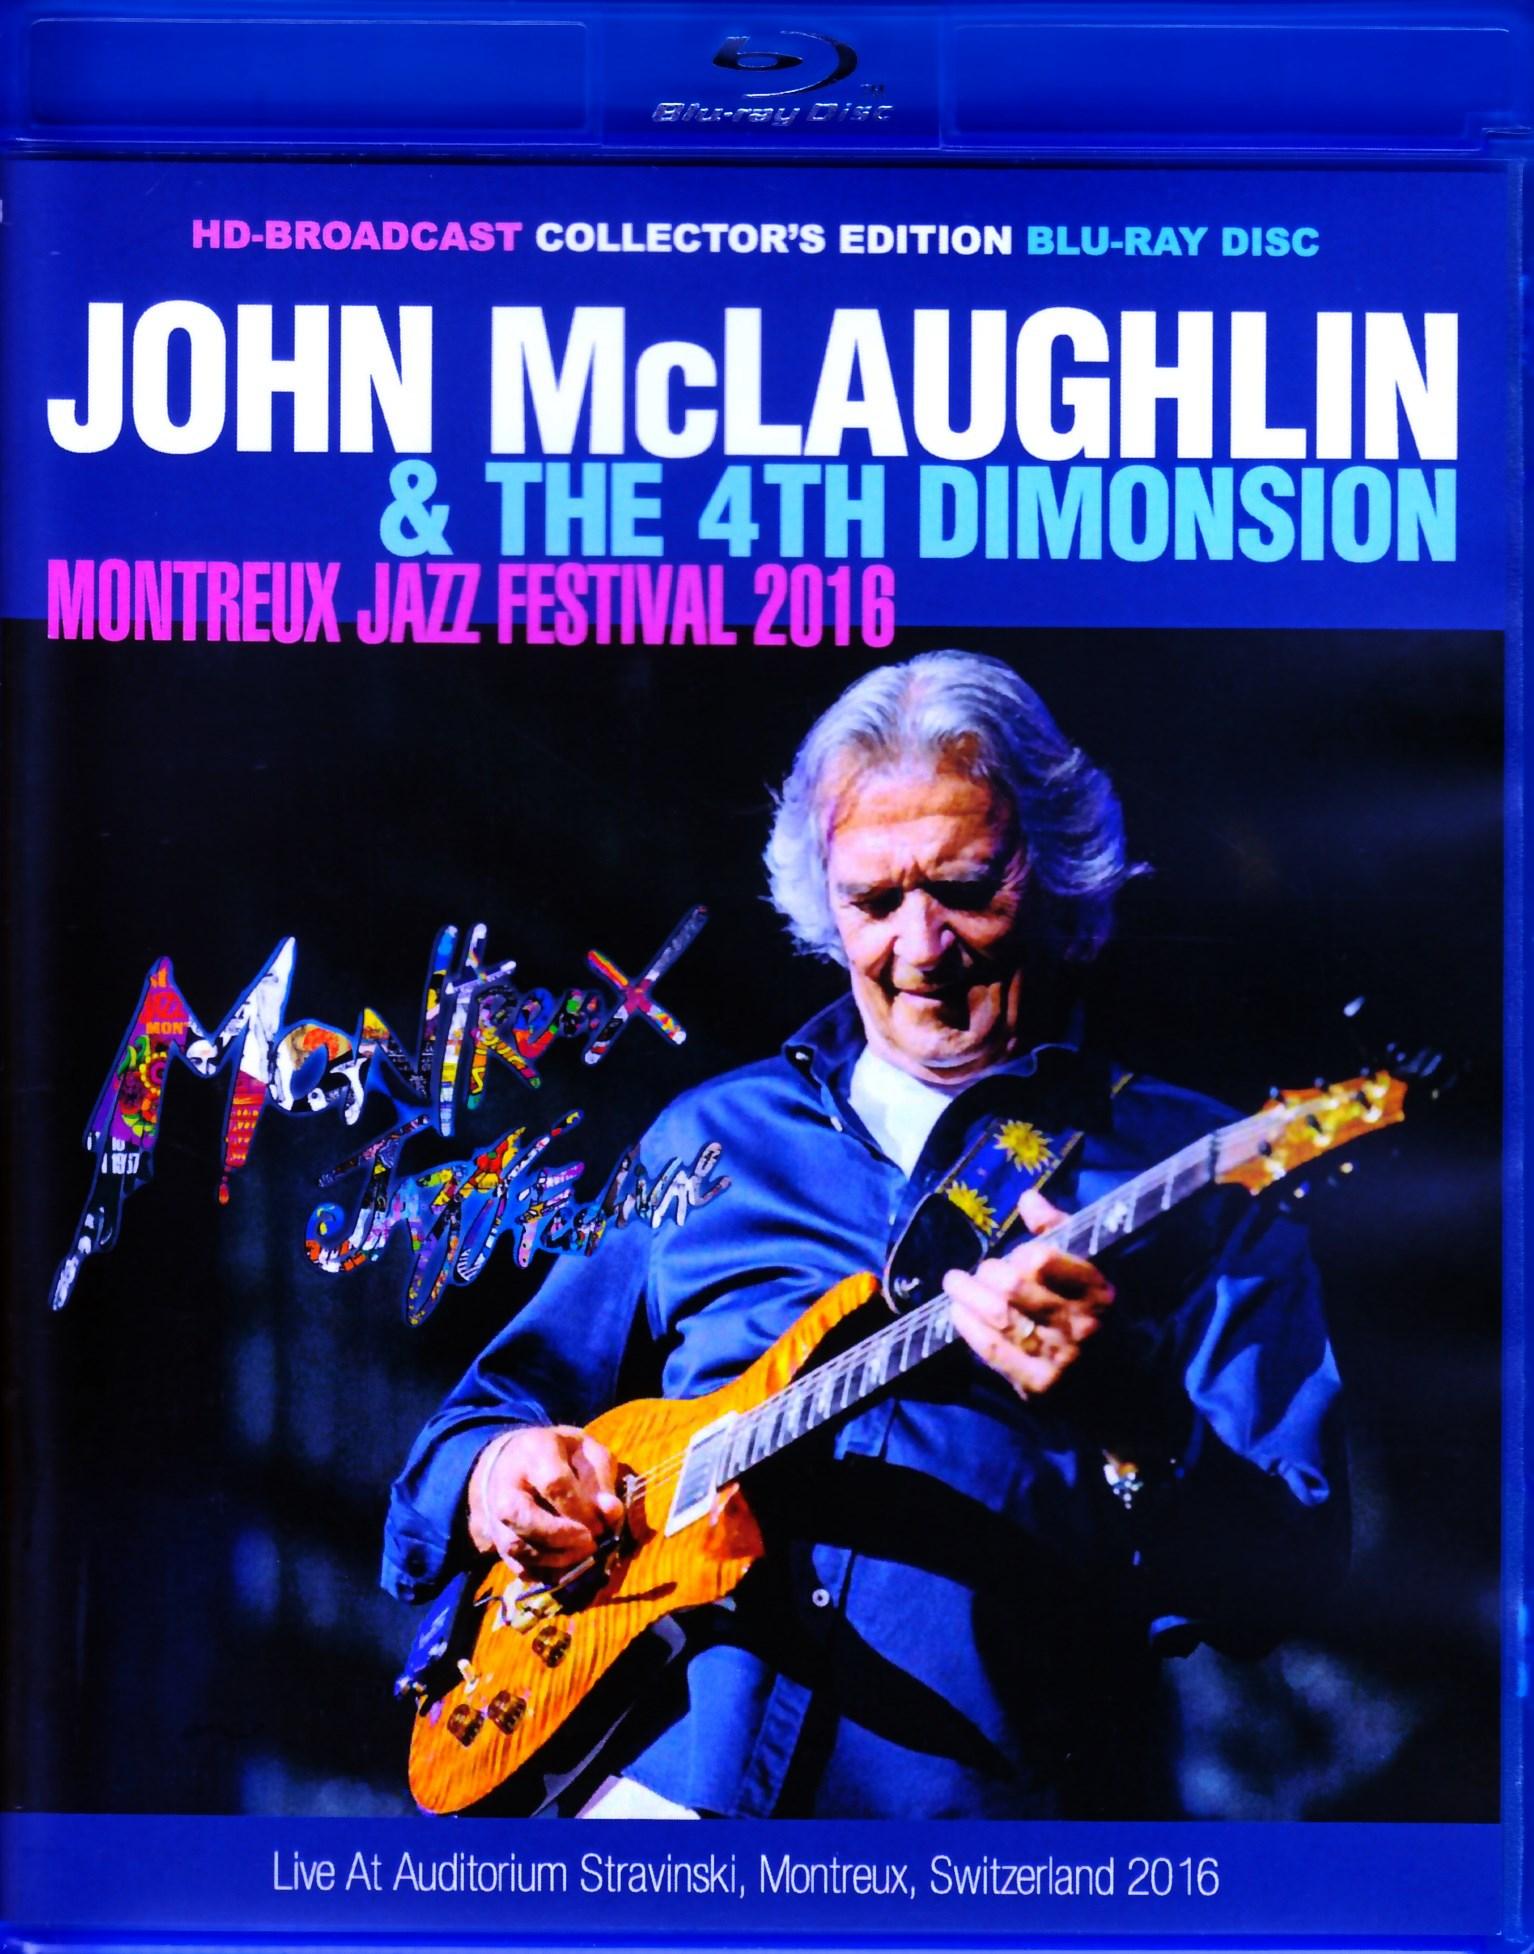 John McLaughlin ジョン・マクラフリン/Switzerland 2016 BRD